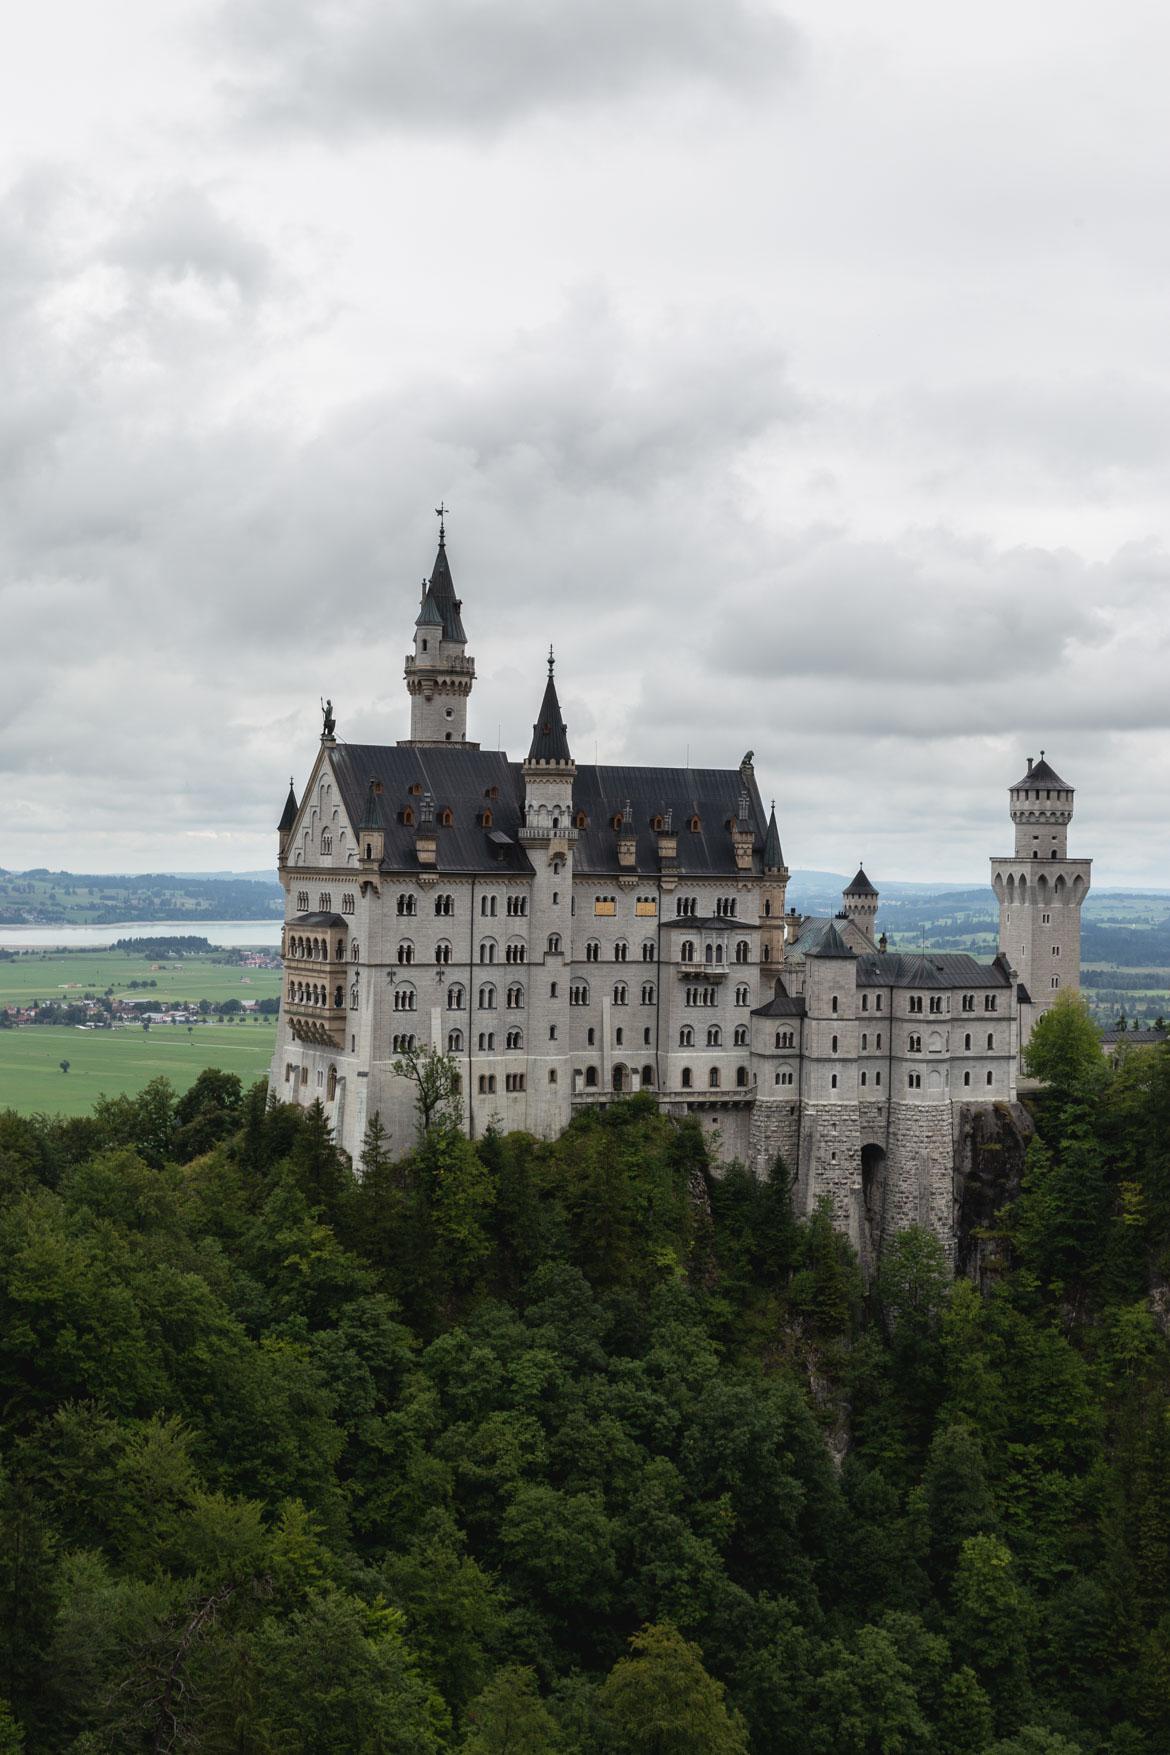 road trip alpes bavaroises autrichiennes chateau neuschwanstein